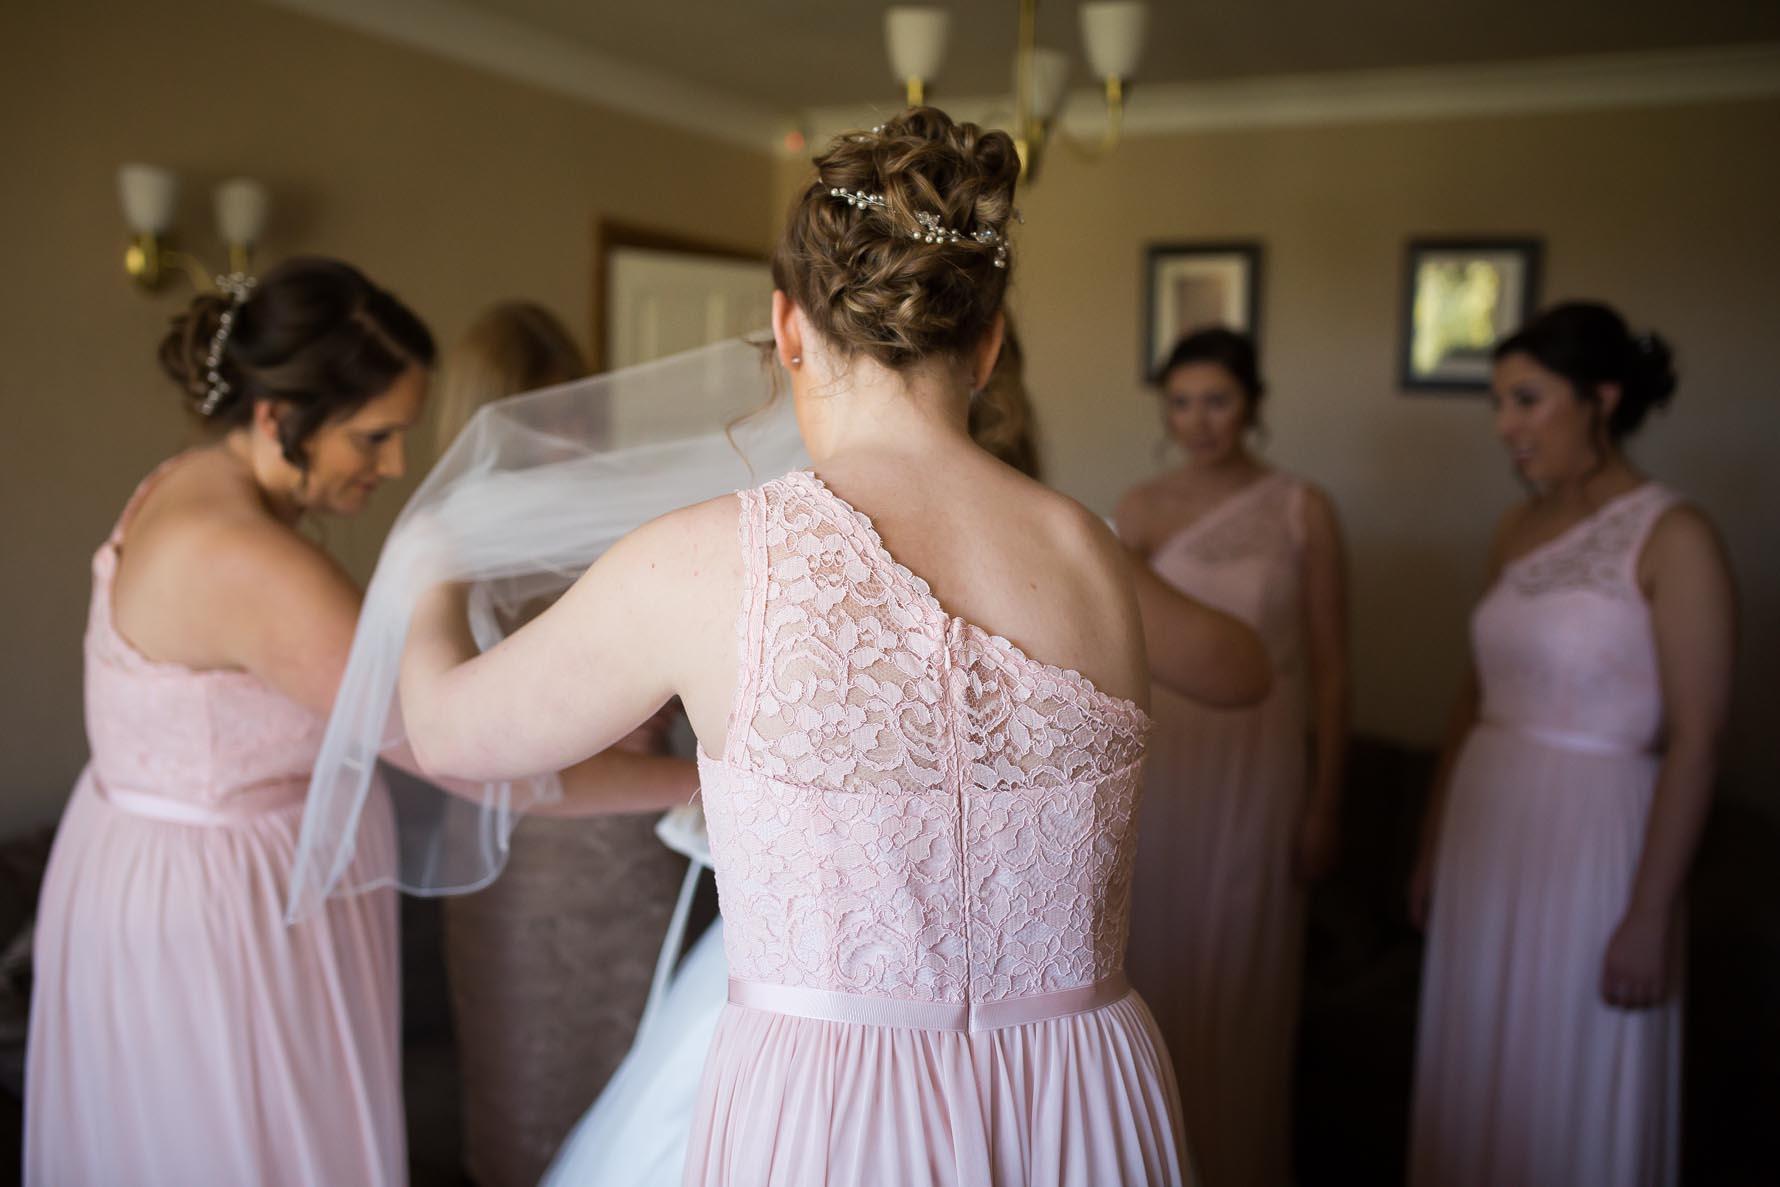 Bridesmaids getting ready lichfield wedding photography